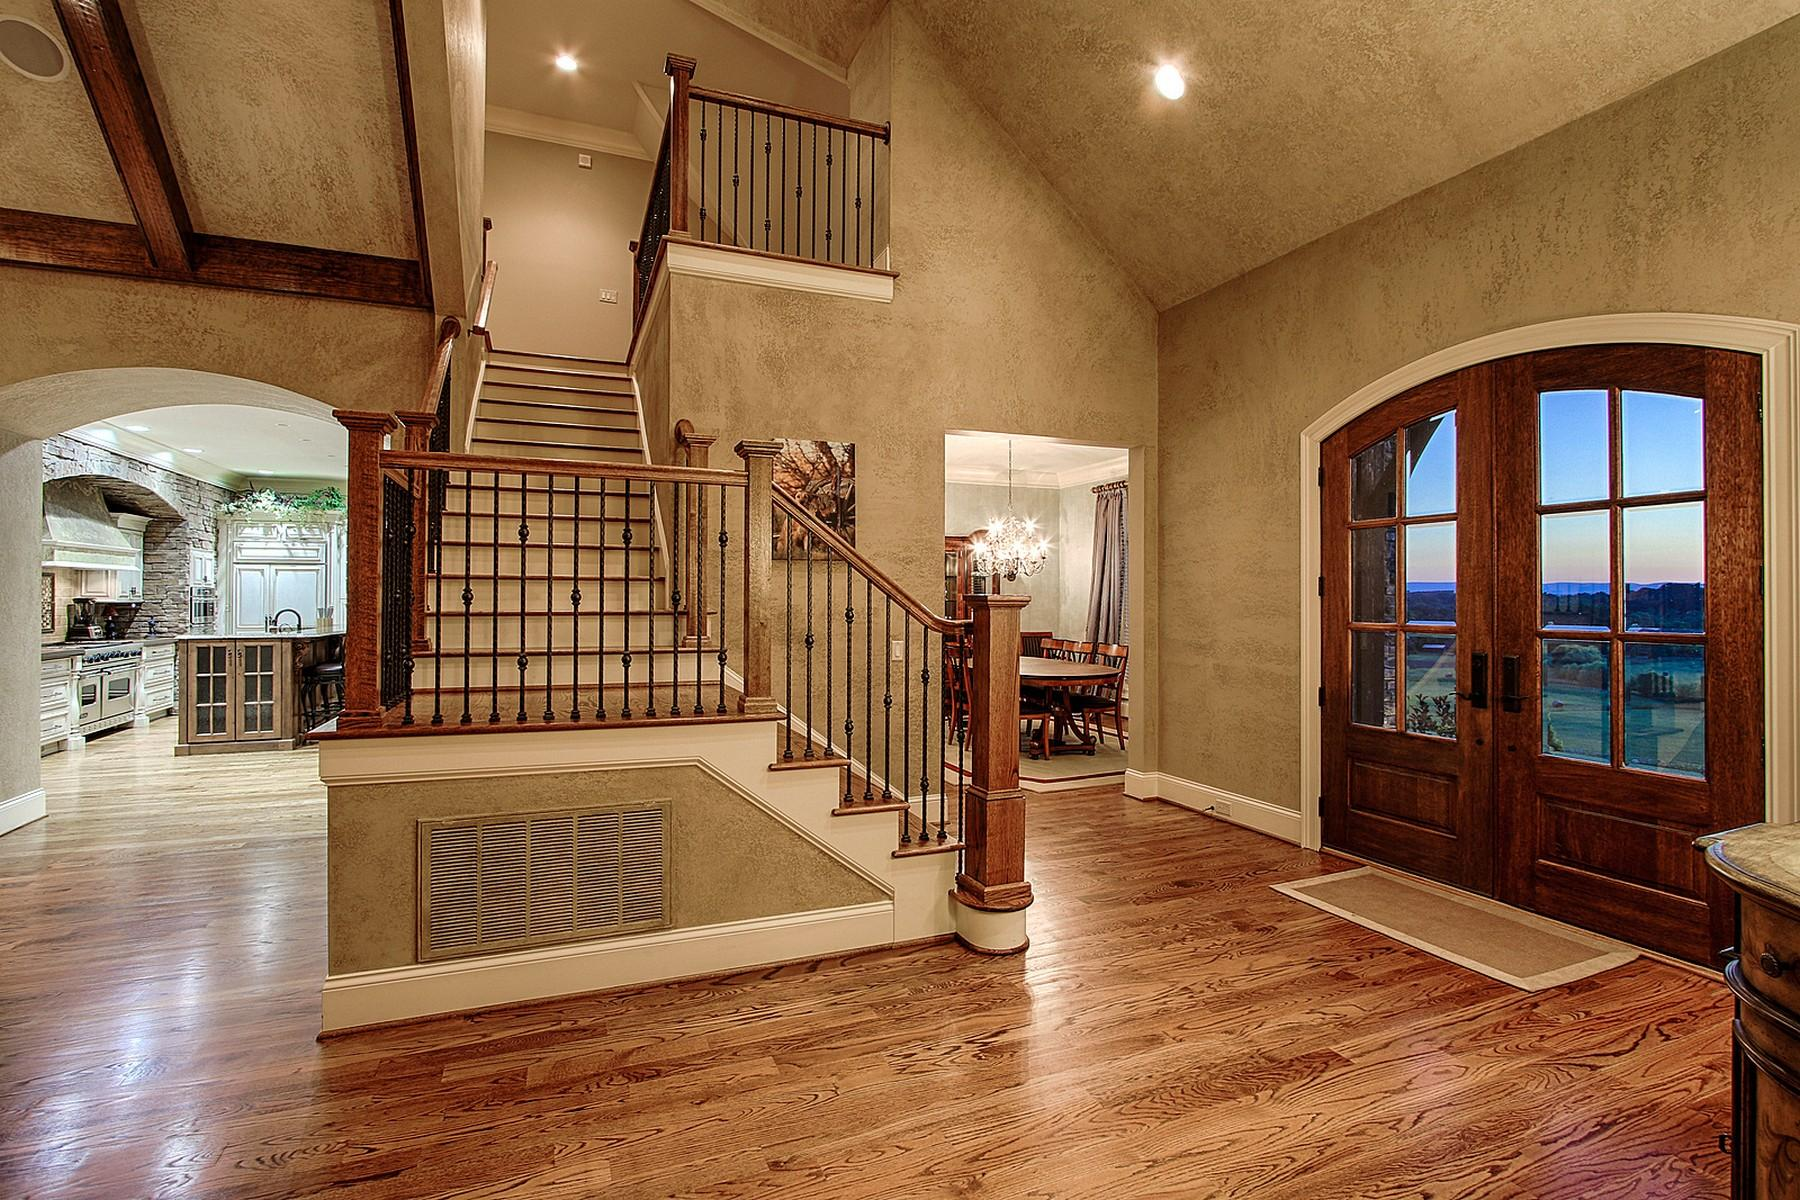 12554 Birchwood Pike, Harrison, Tennessee 37341, 4 Bedrooms Bedrooms, ,3 BathroomsBathrooms,Rental,For Sale,Birchwood,1067891